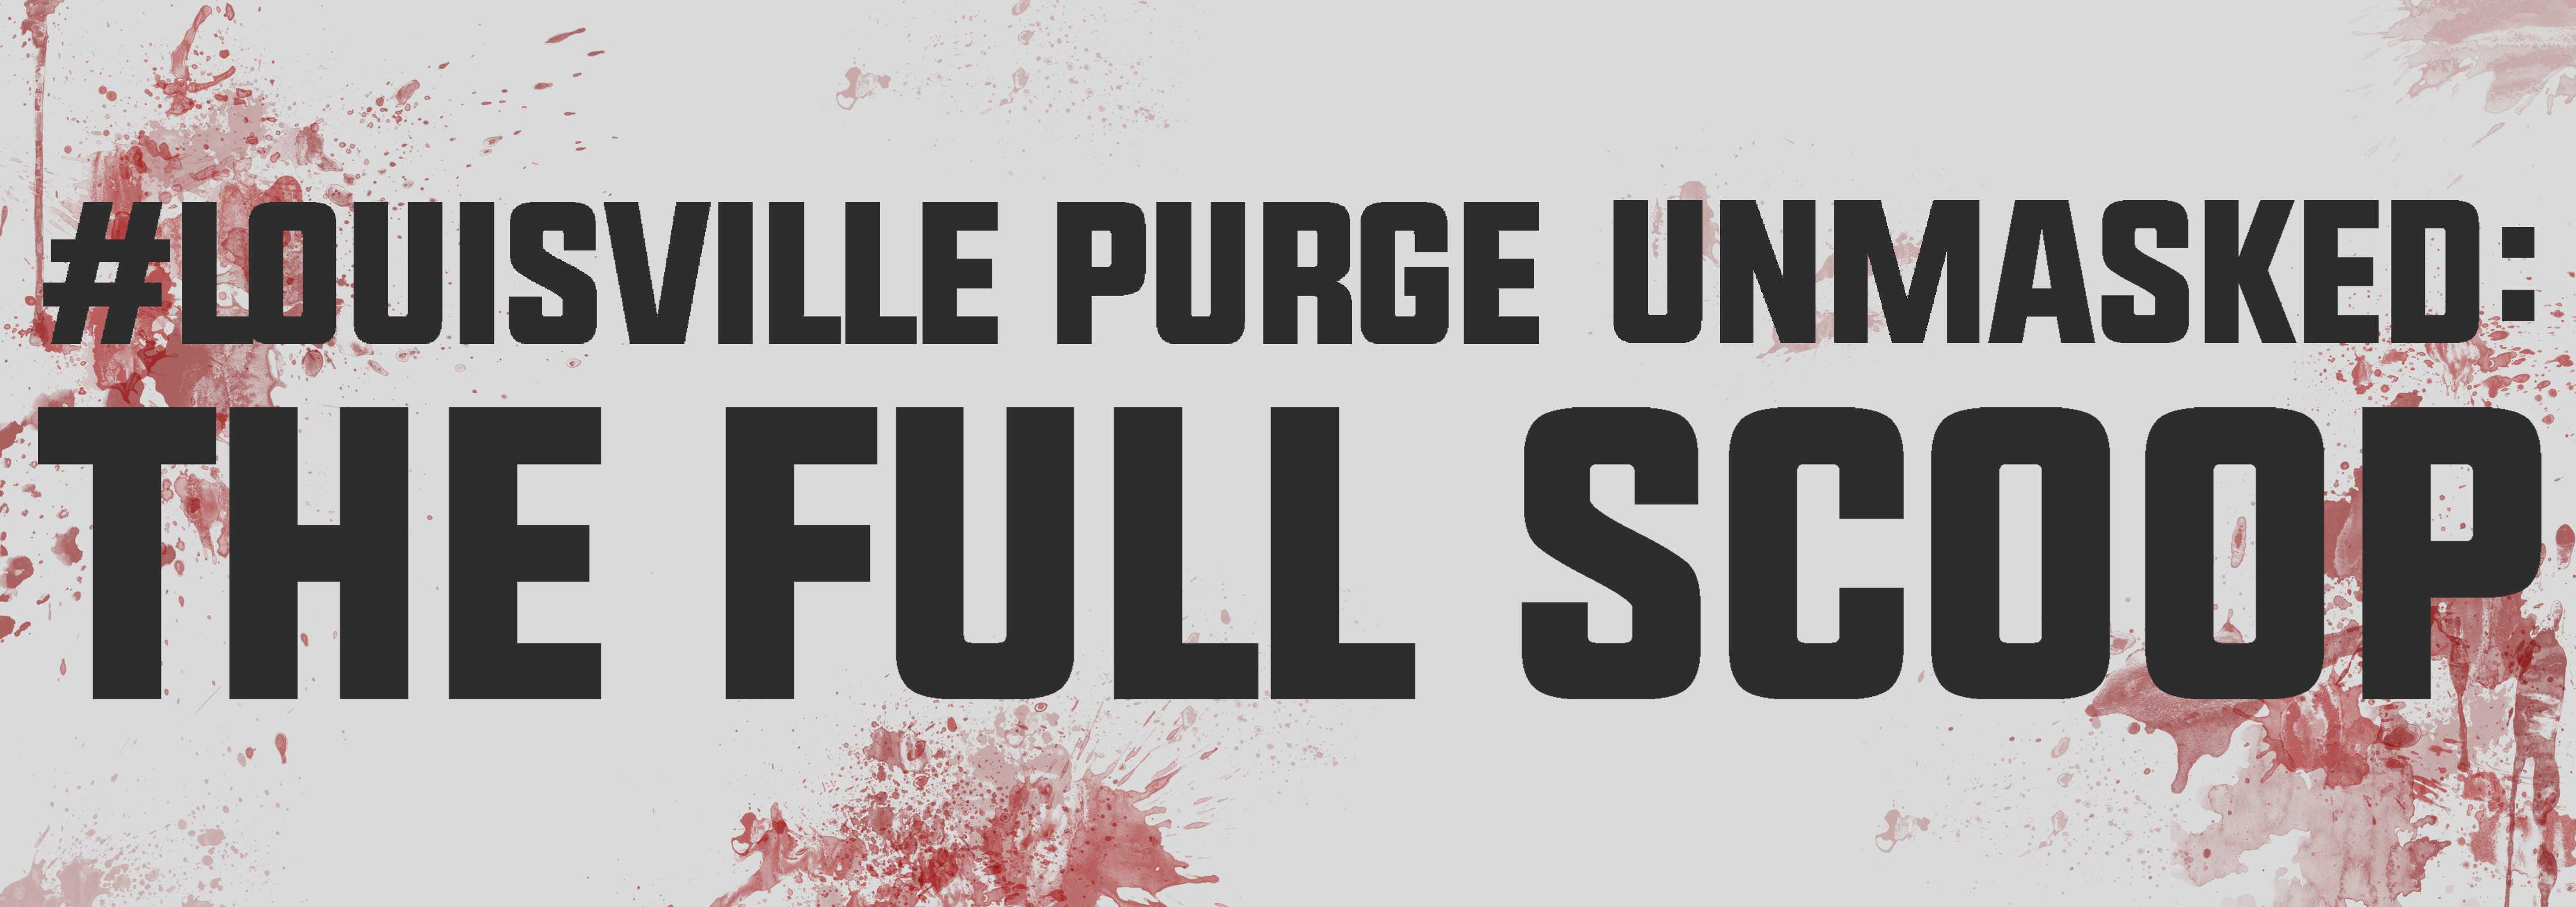 purge-header